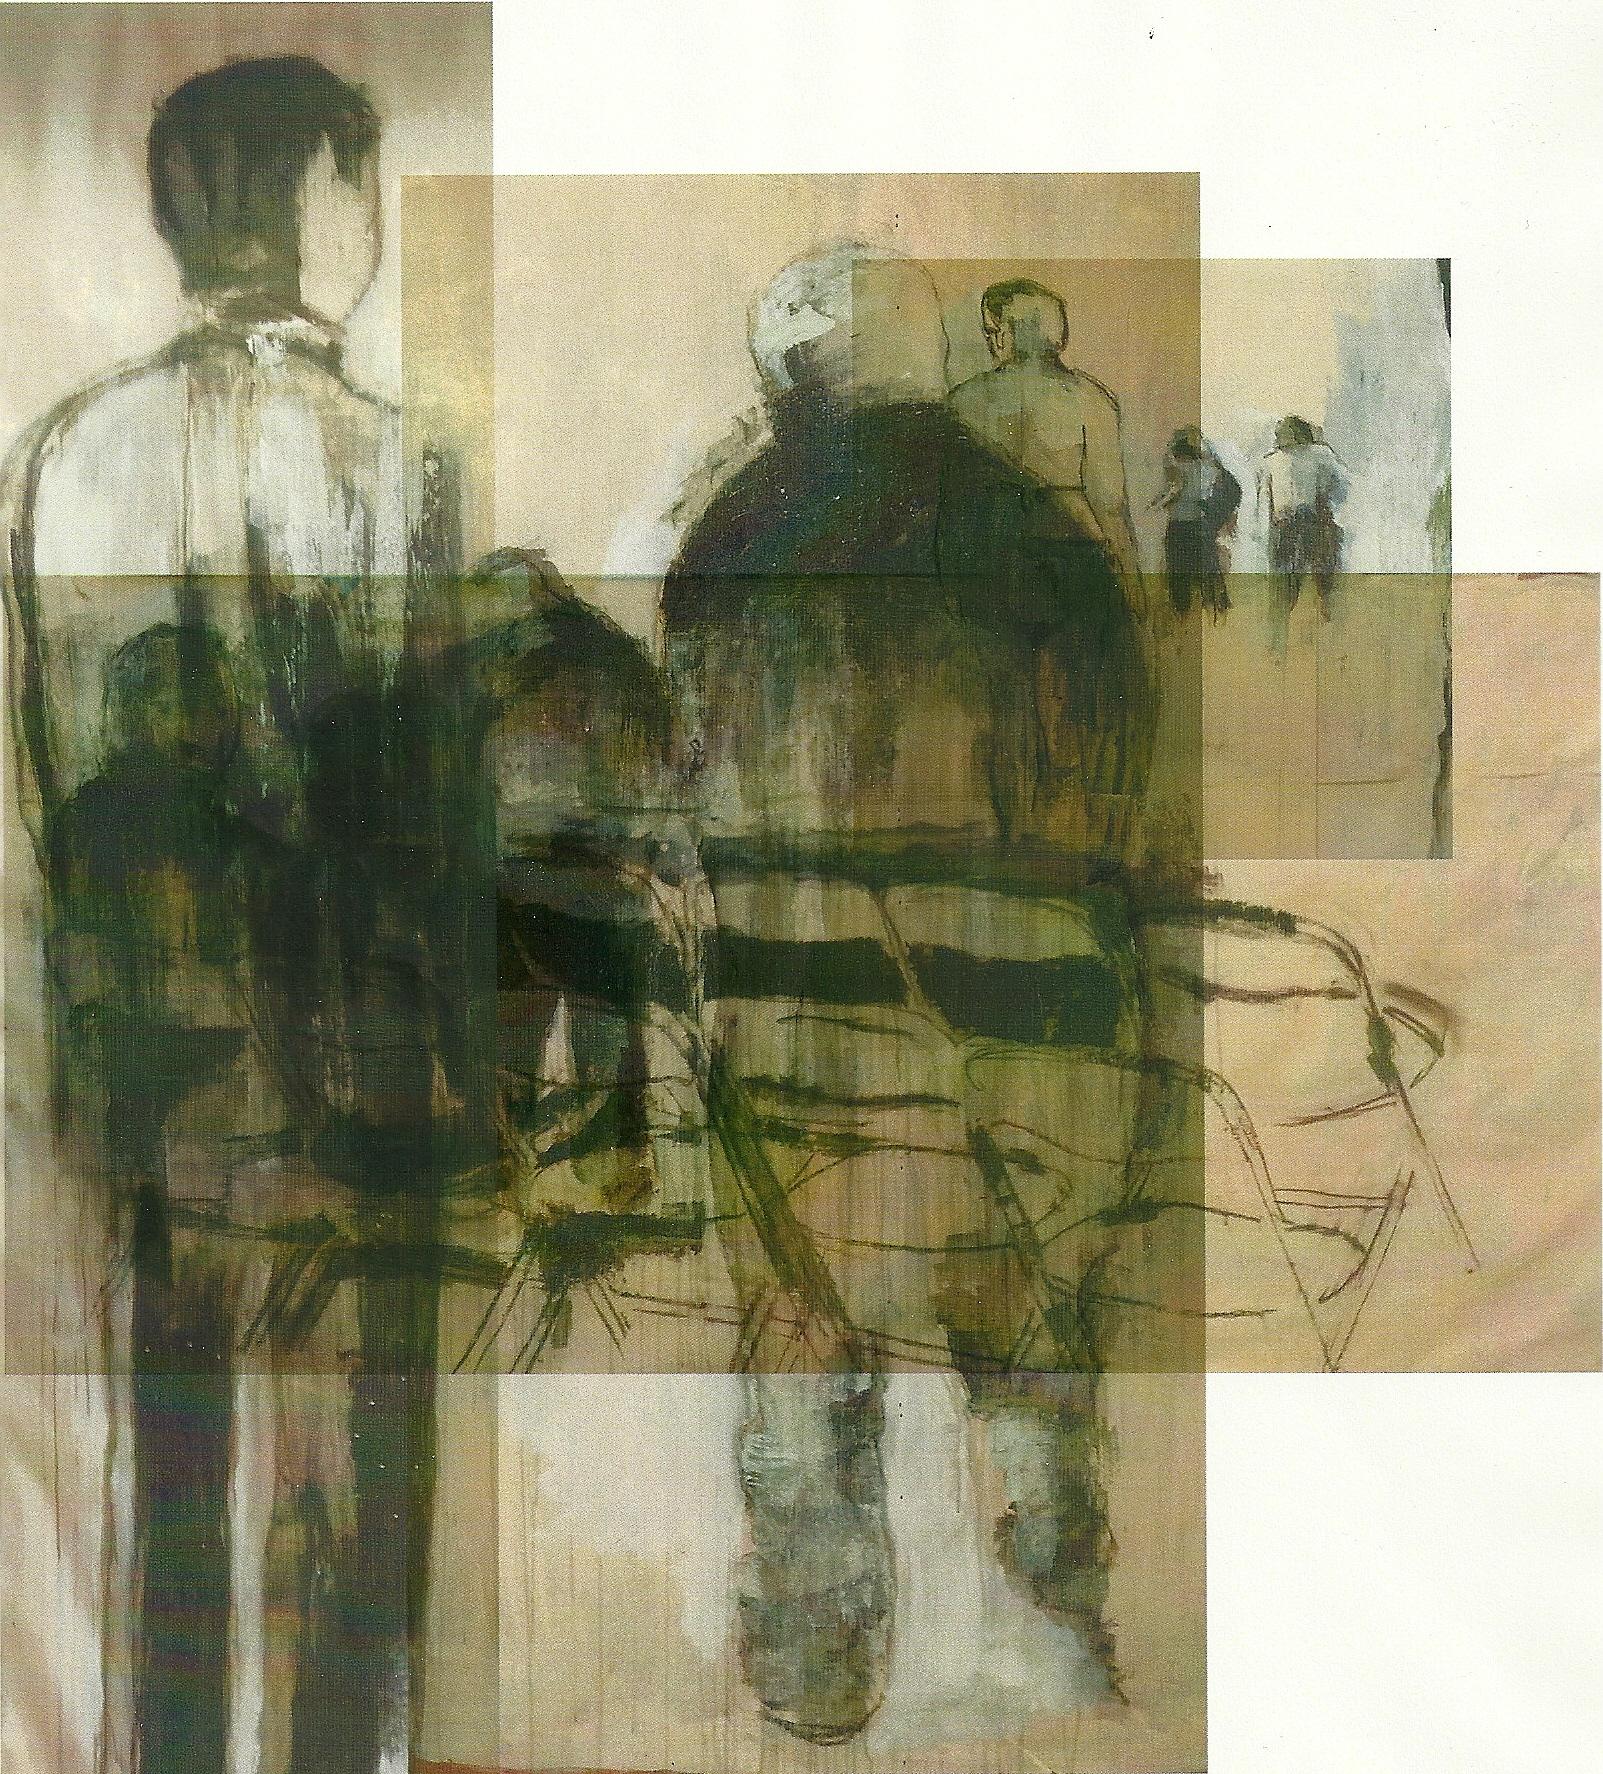 Untitled III, V. 2